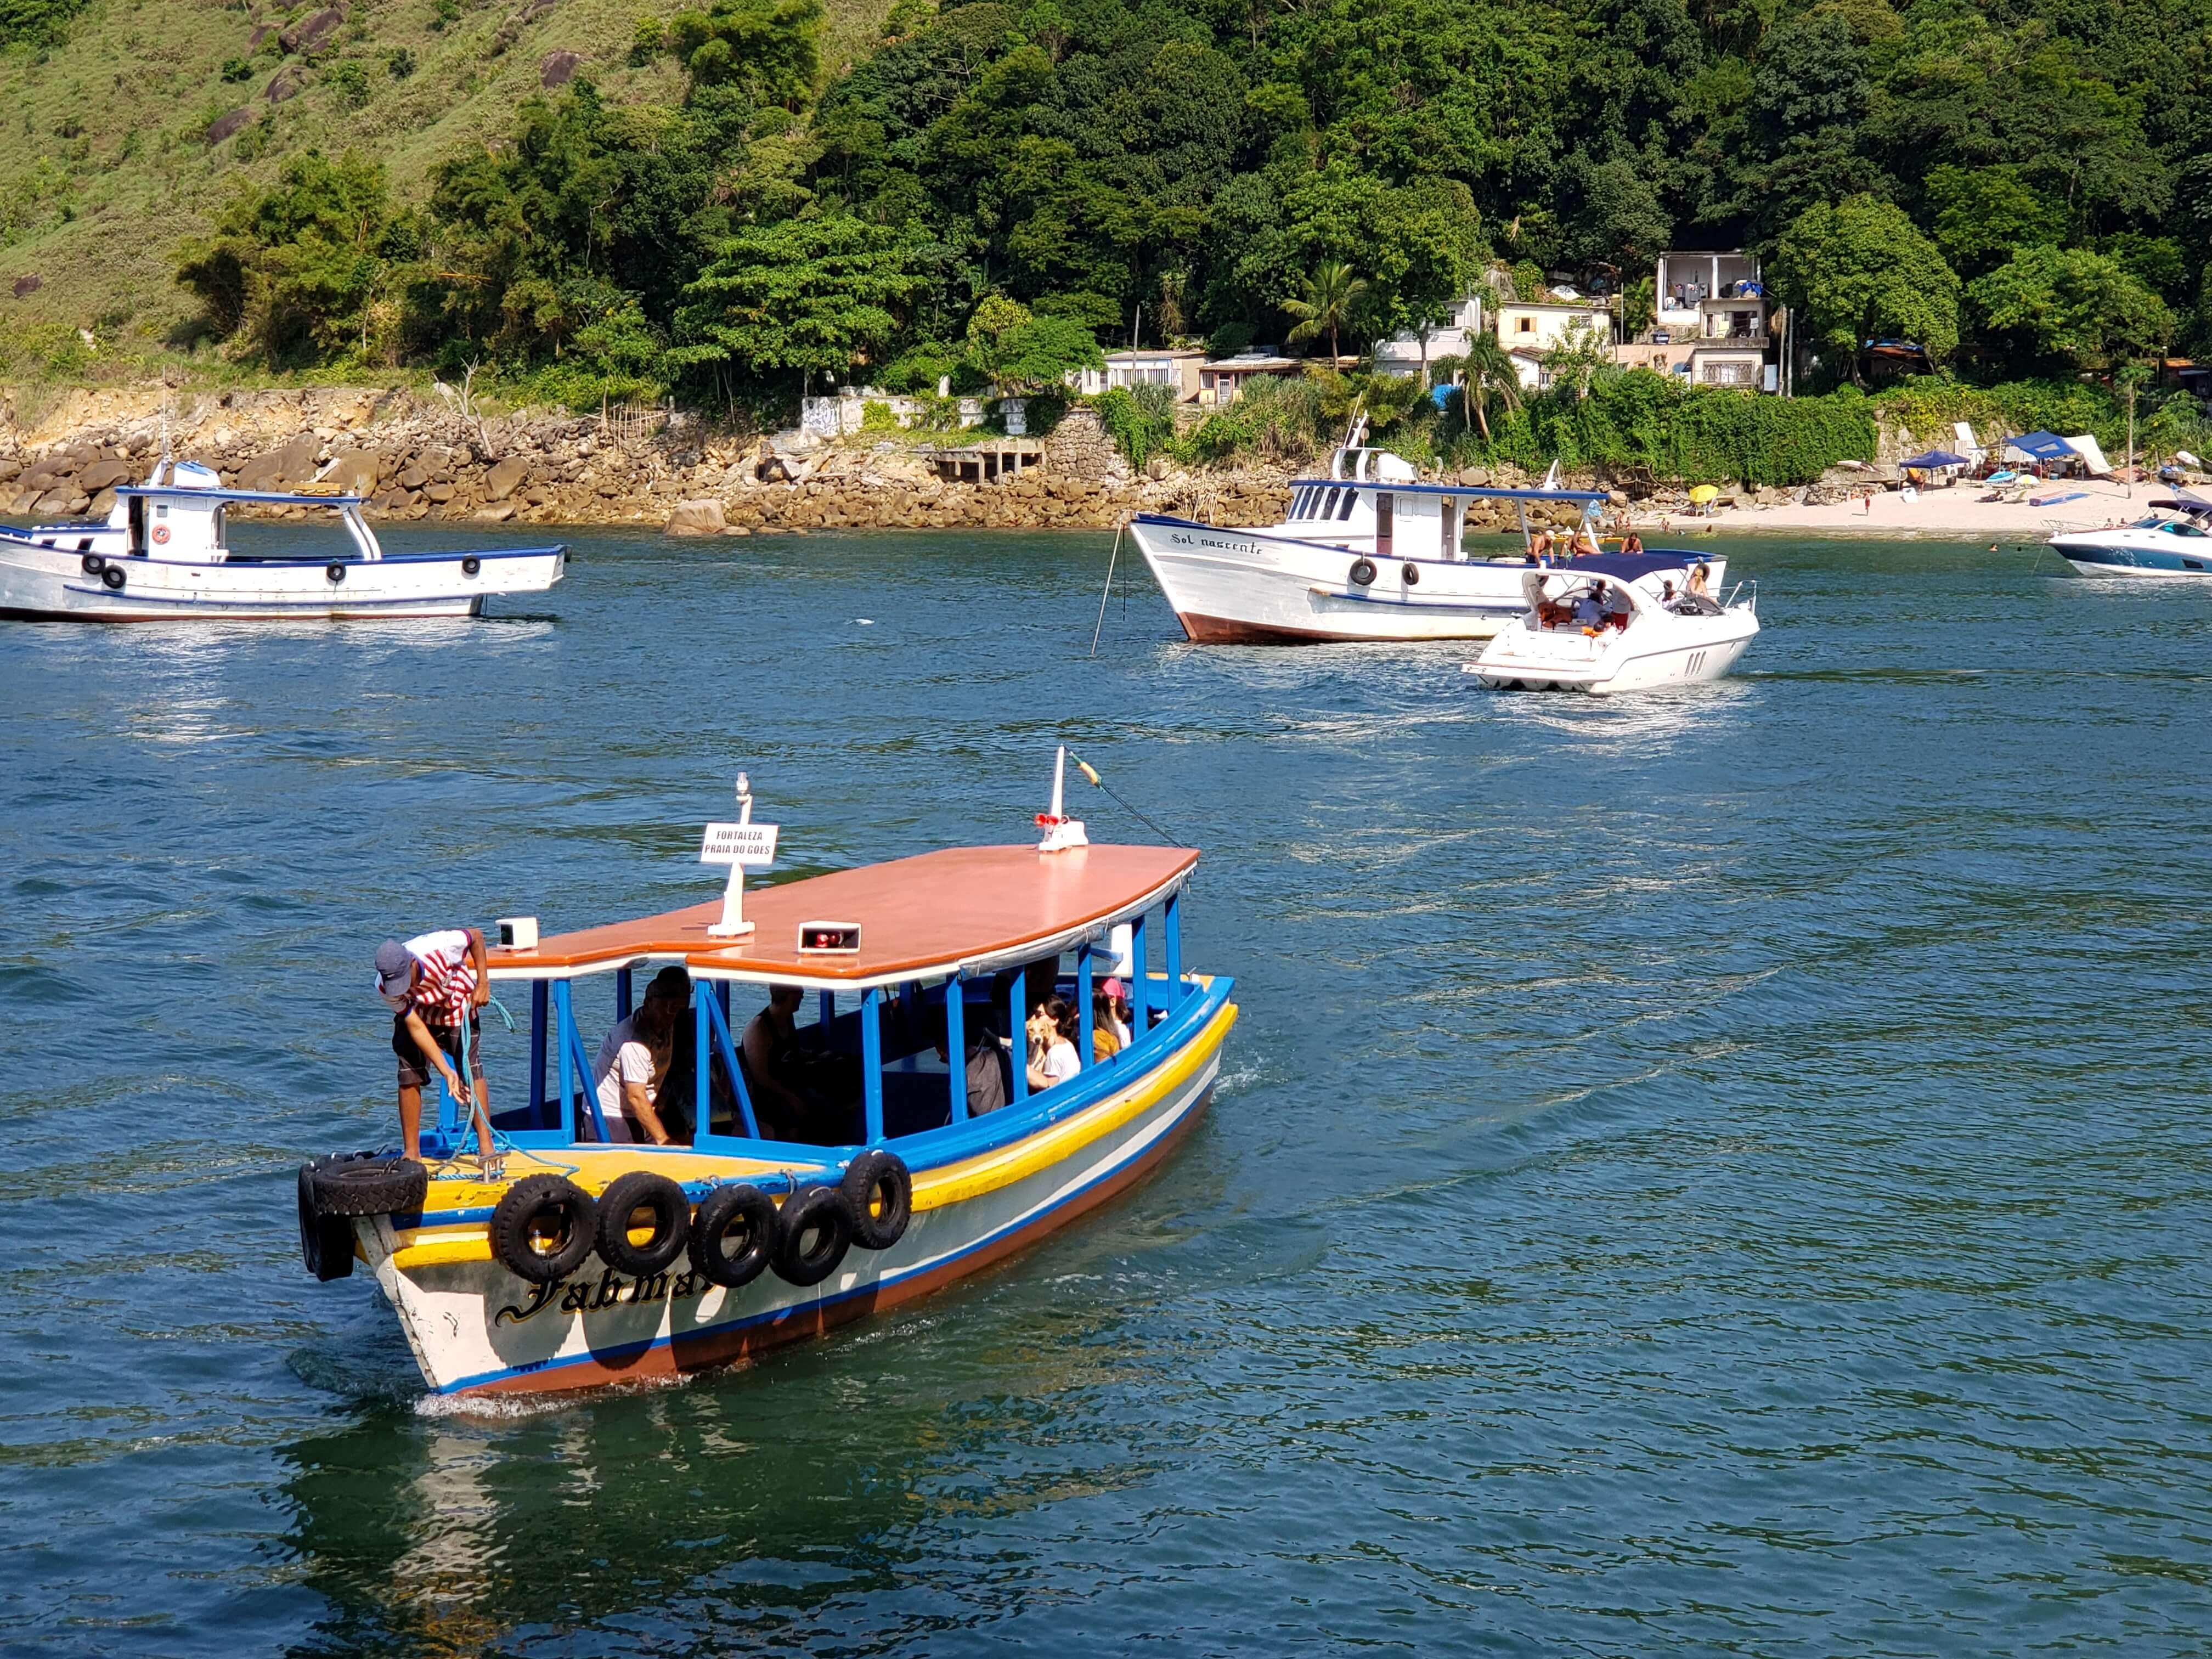 Barcos travessia